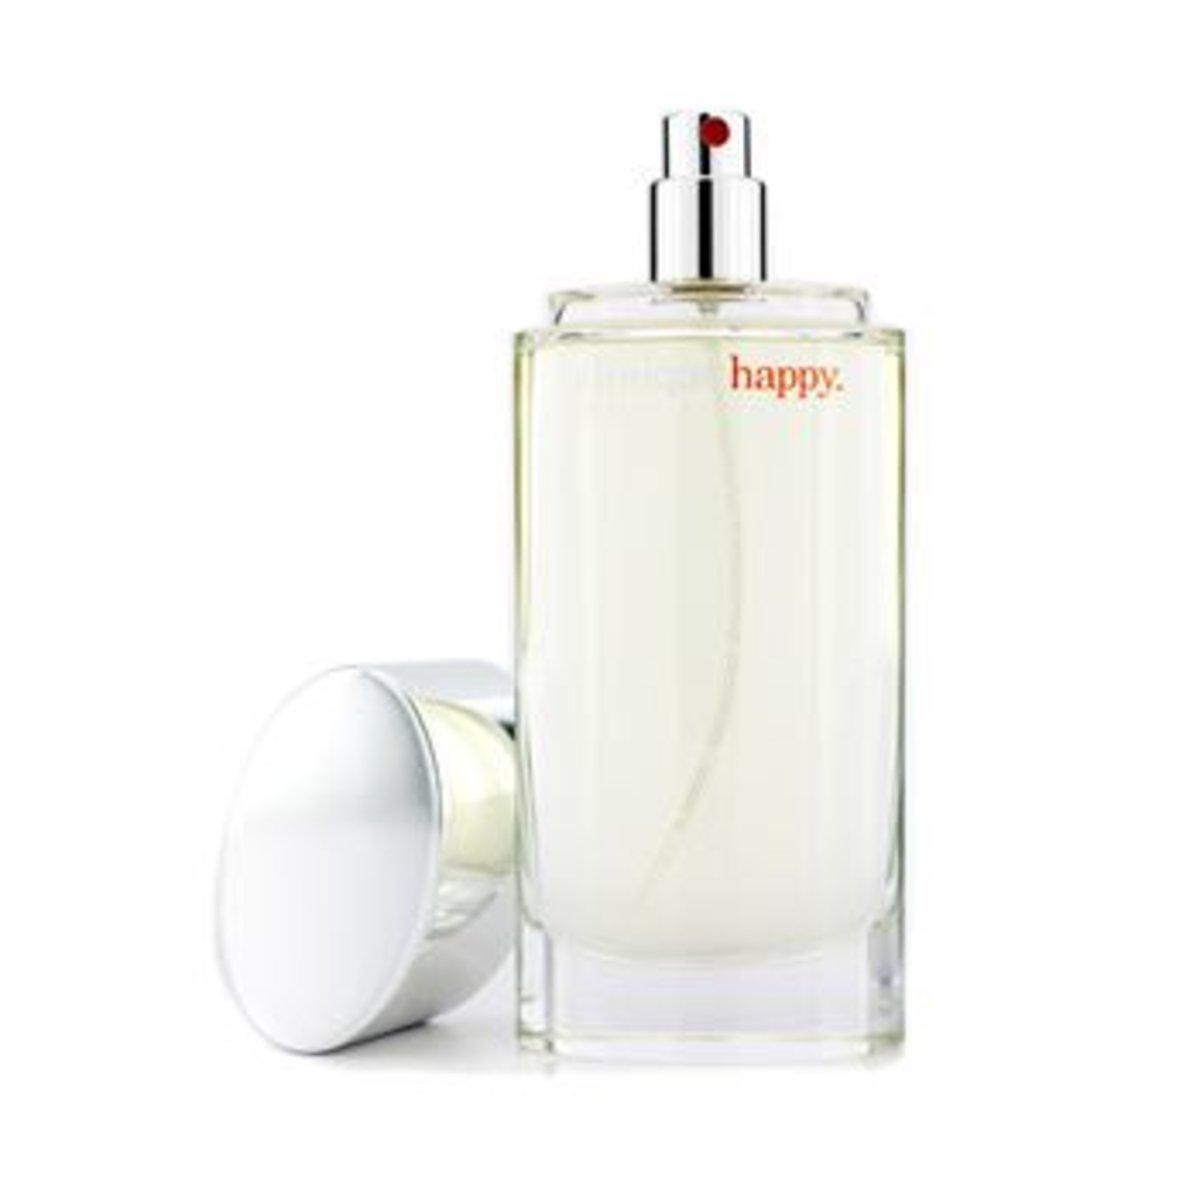 Clinique Happy Eau De Parfum Spray Parallel Import Product For Women Perfume Hktvmall Online Shopping